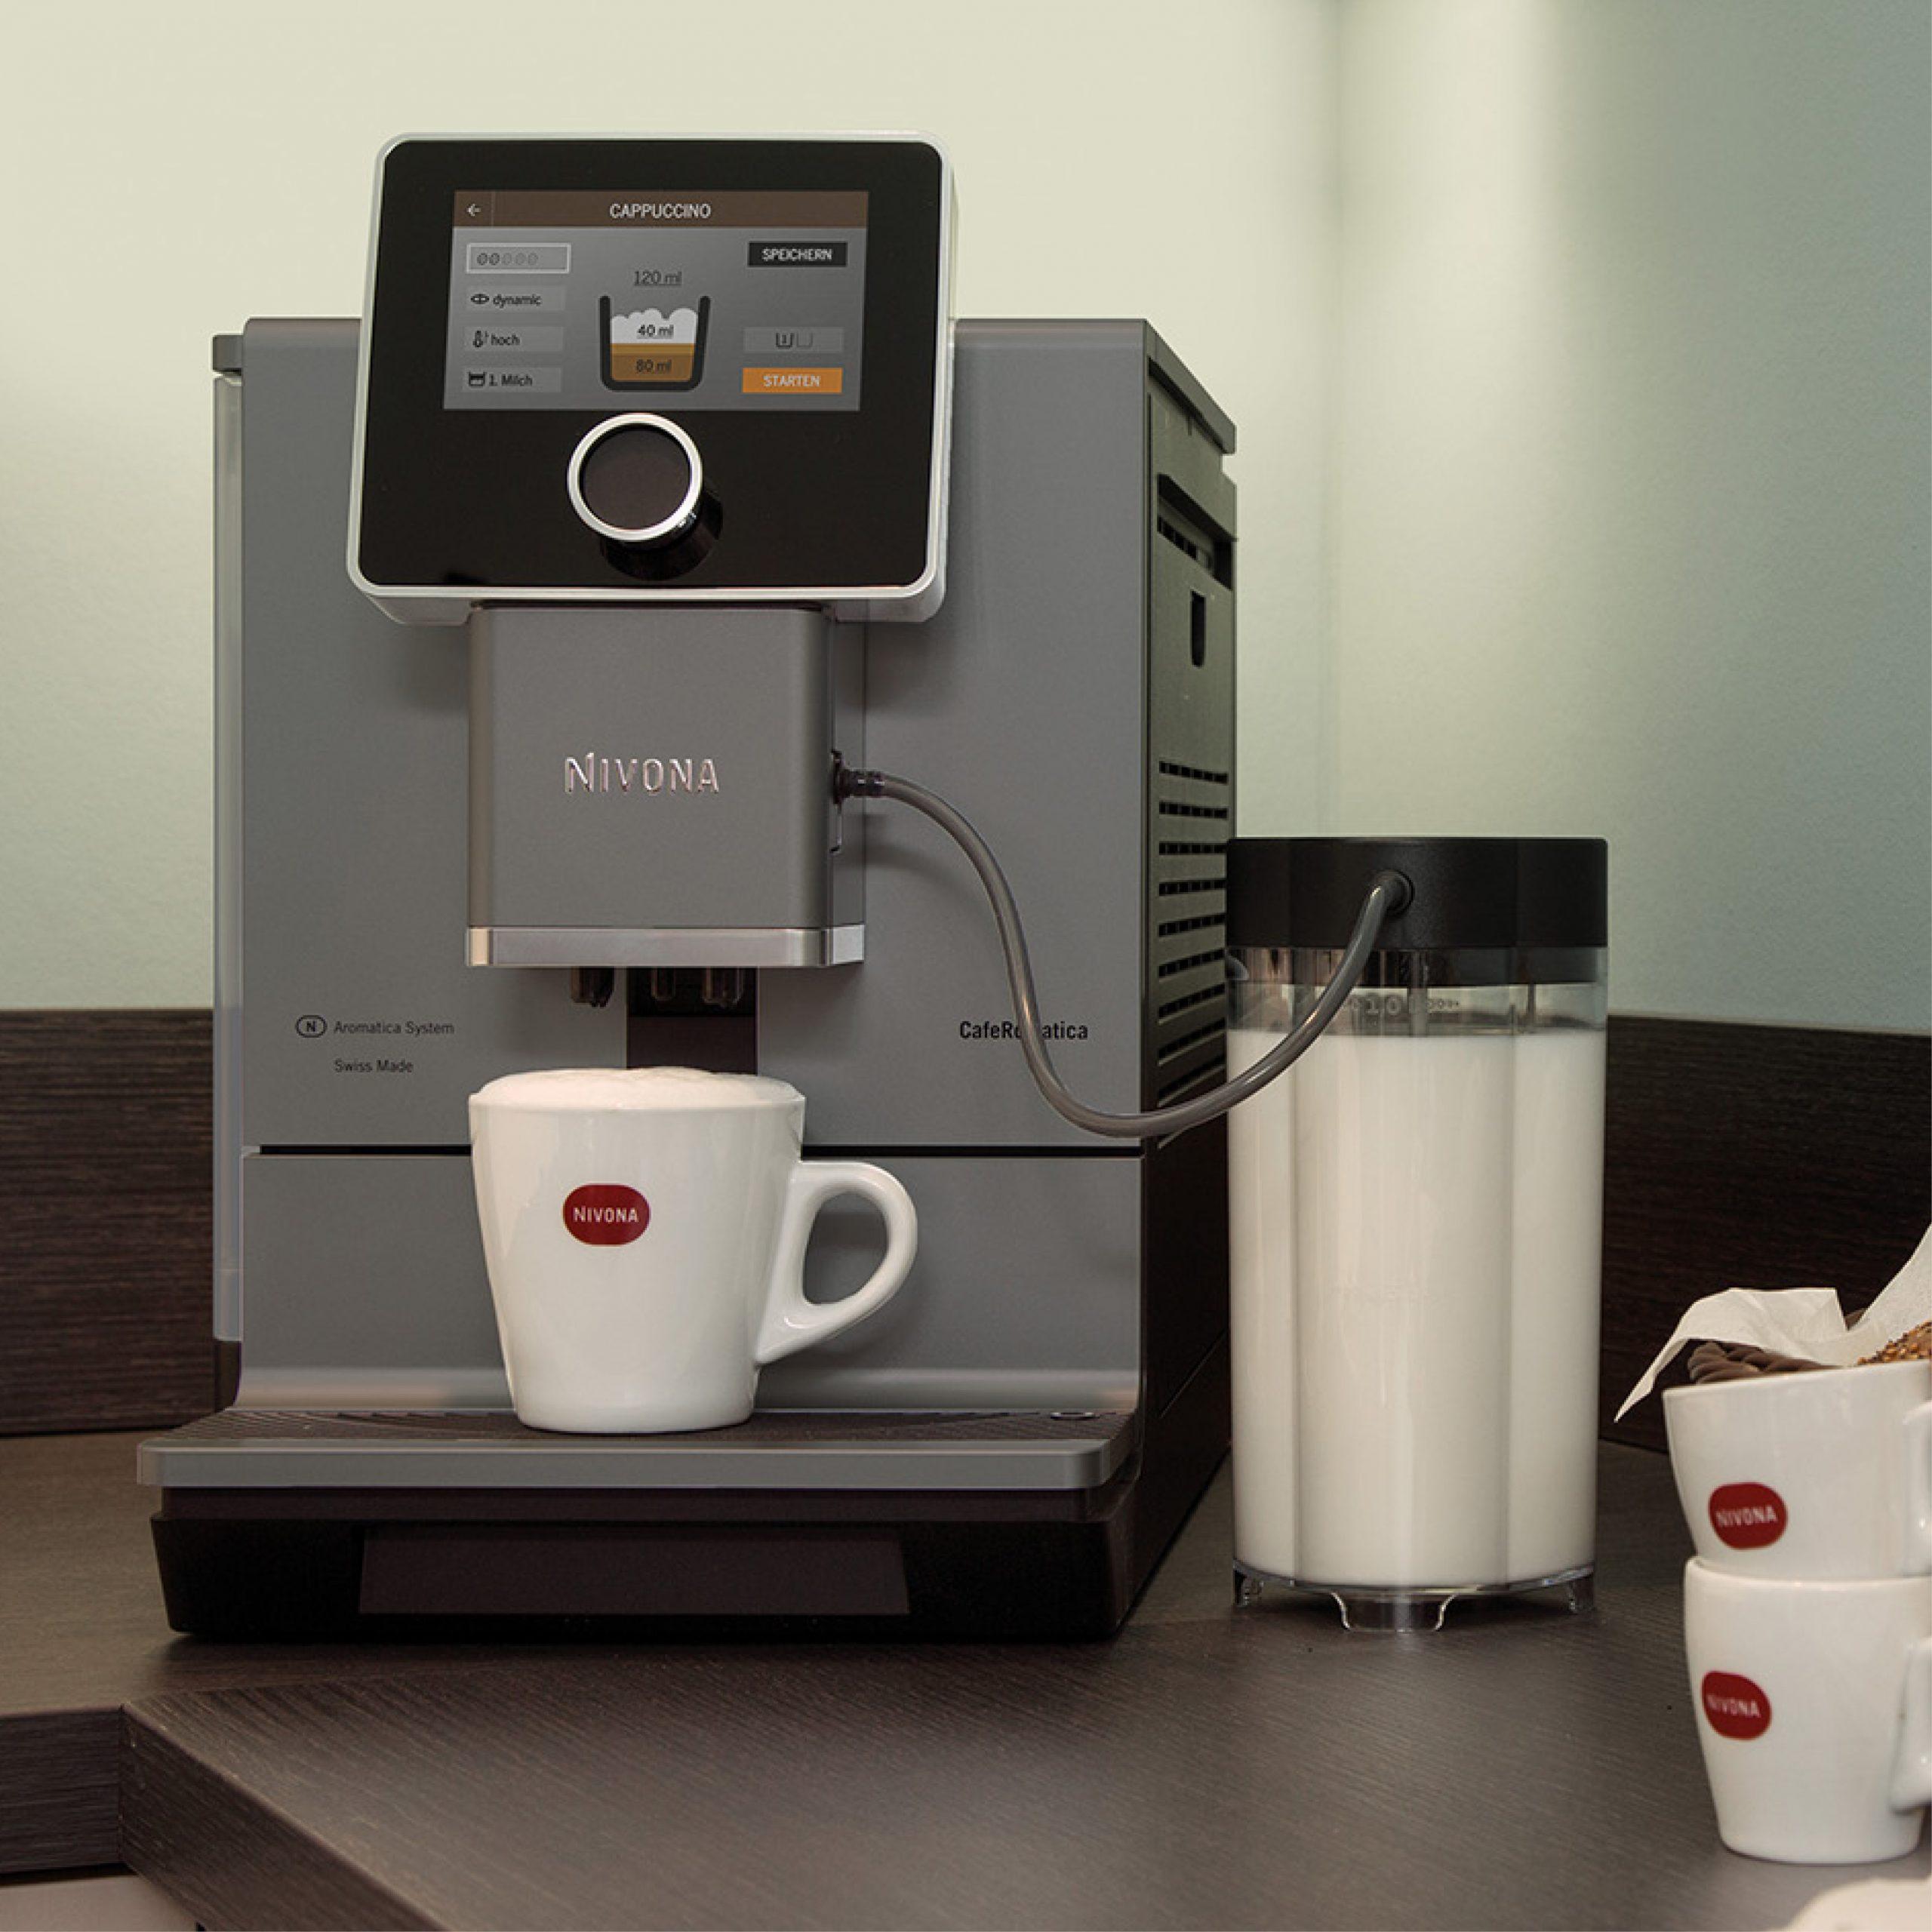 NIVONA CafeRomantica NICR970